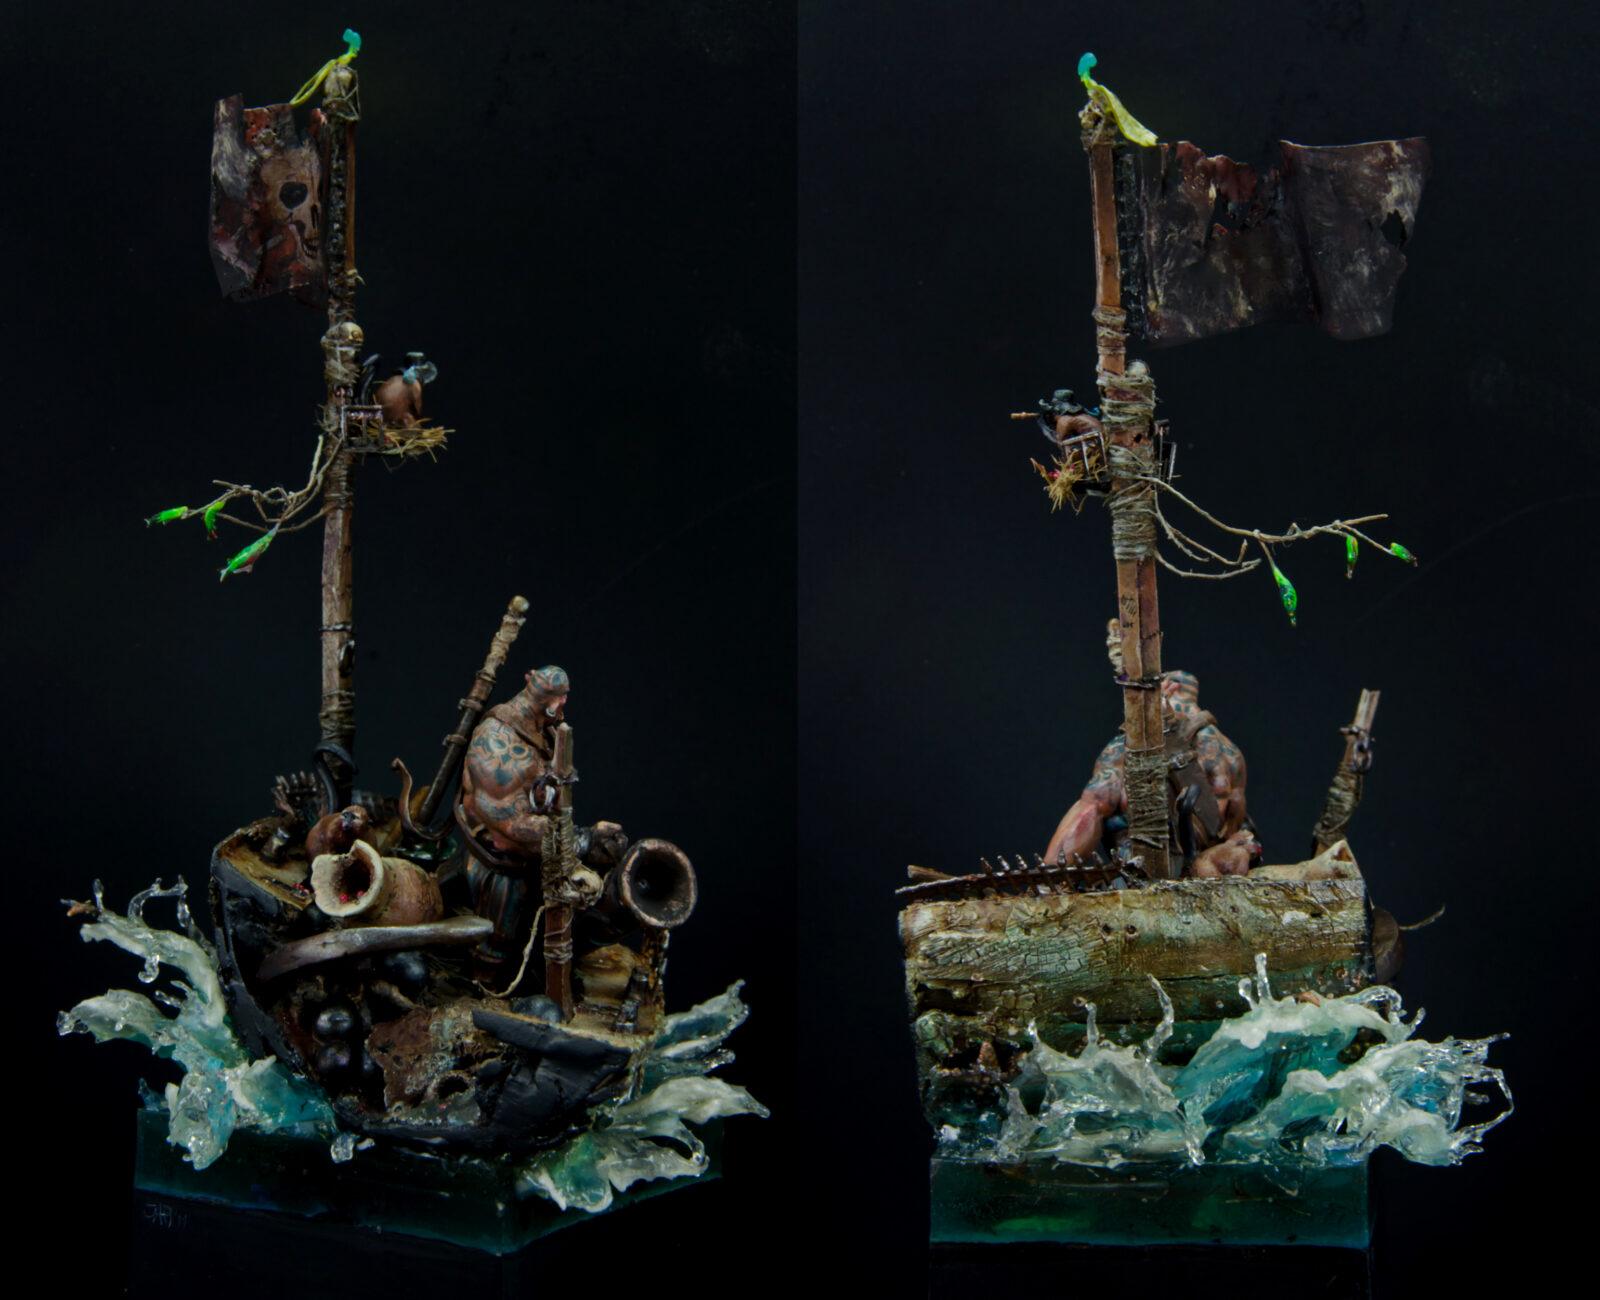 Piratbig02